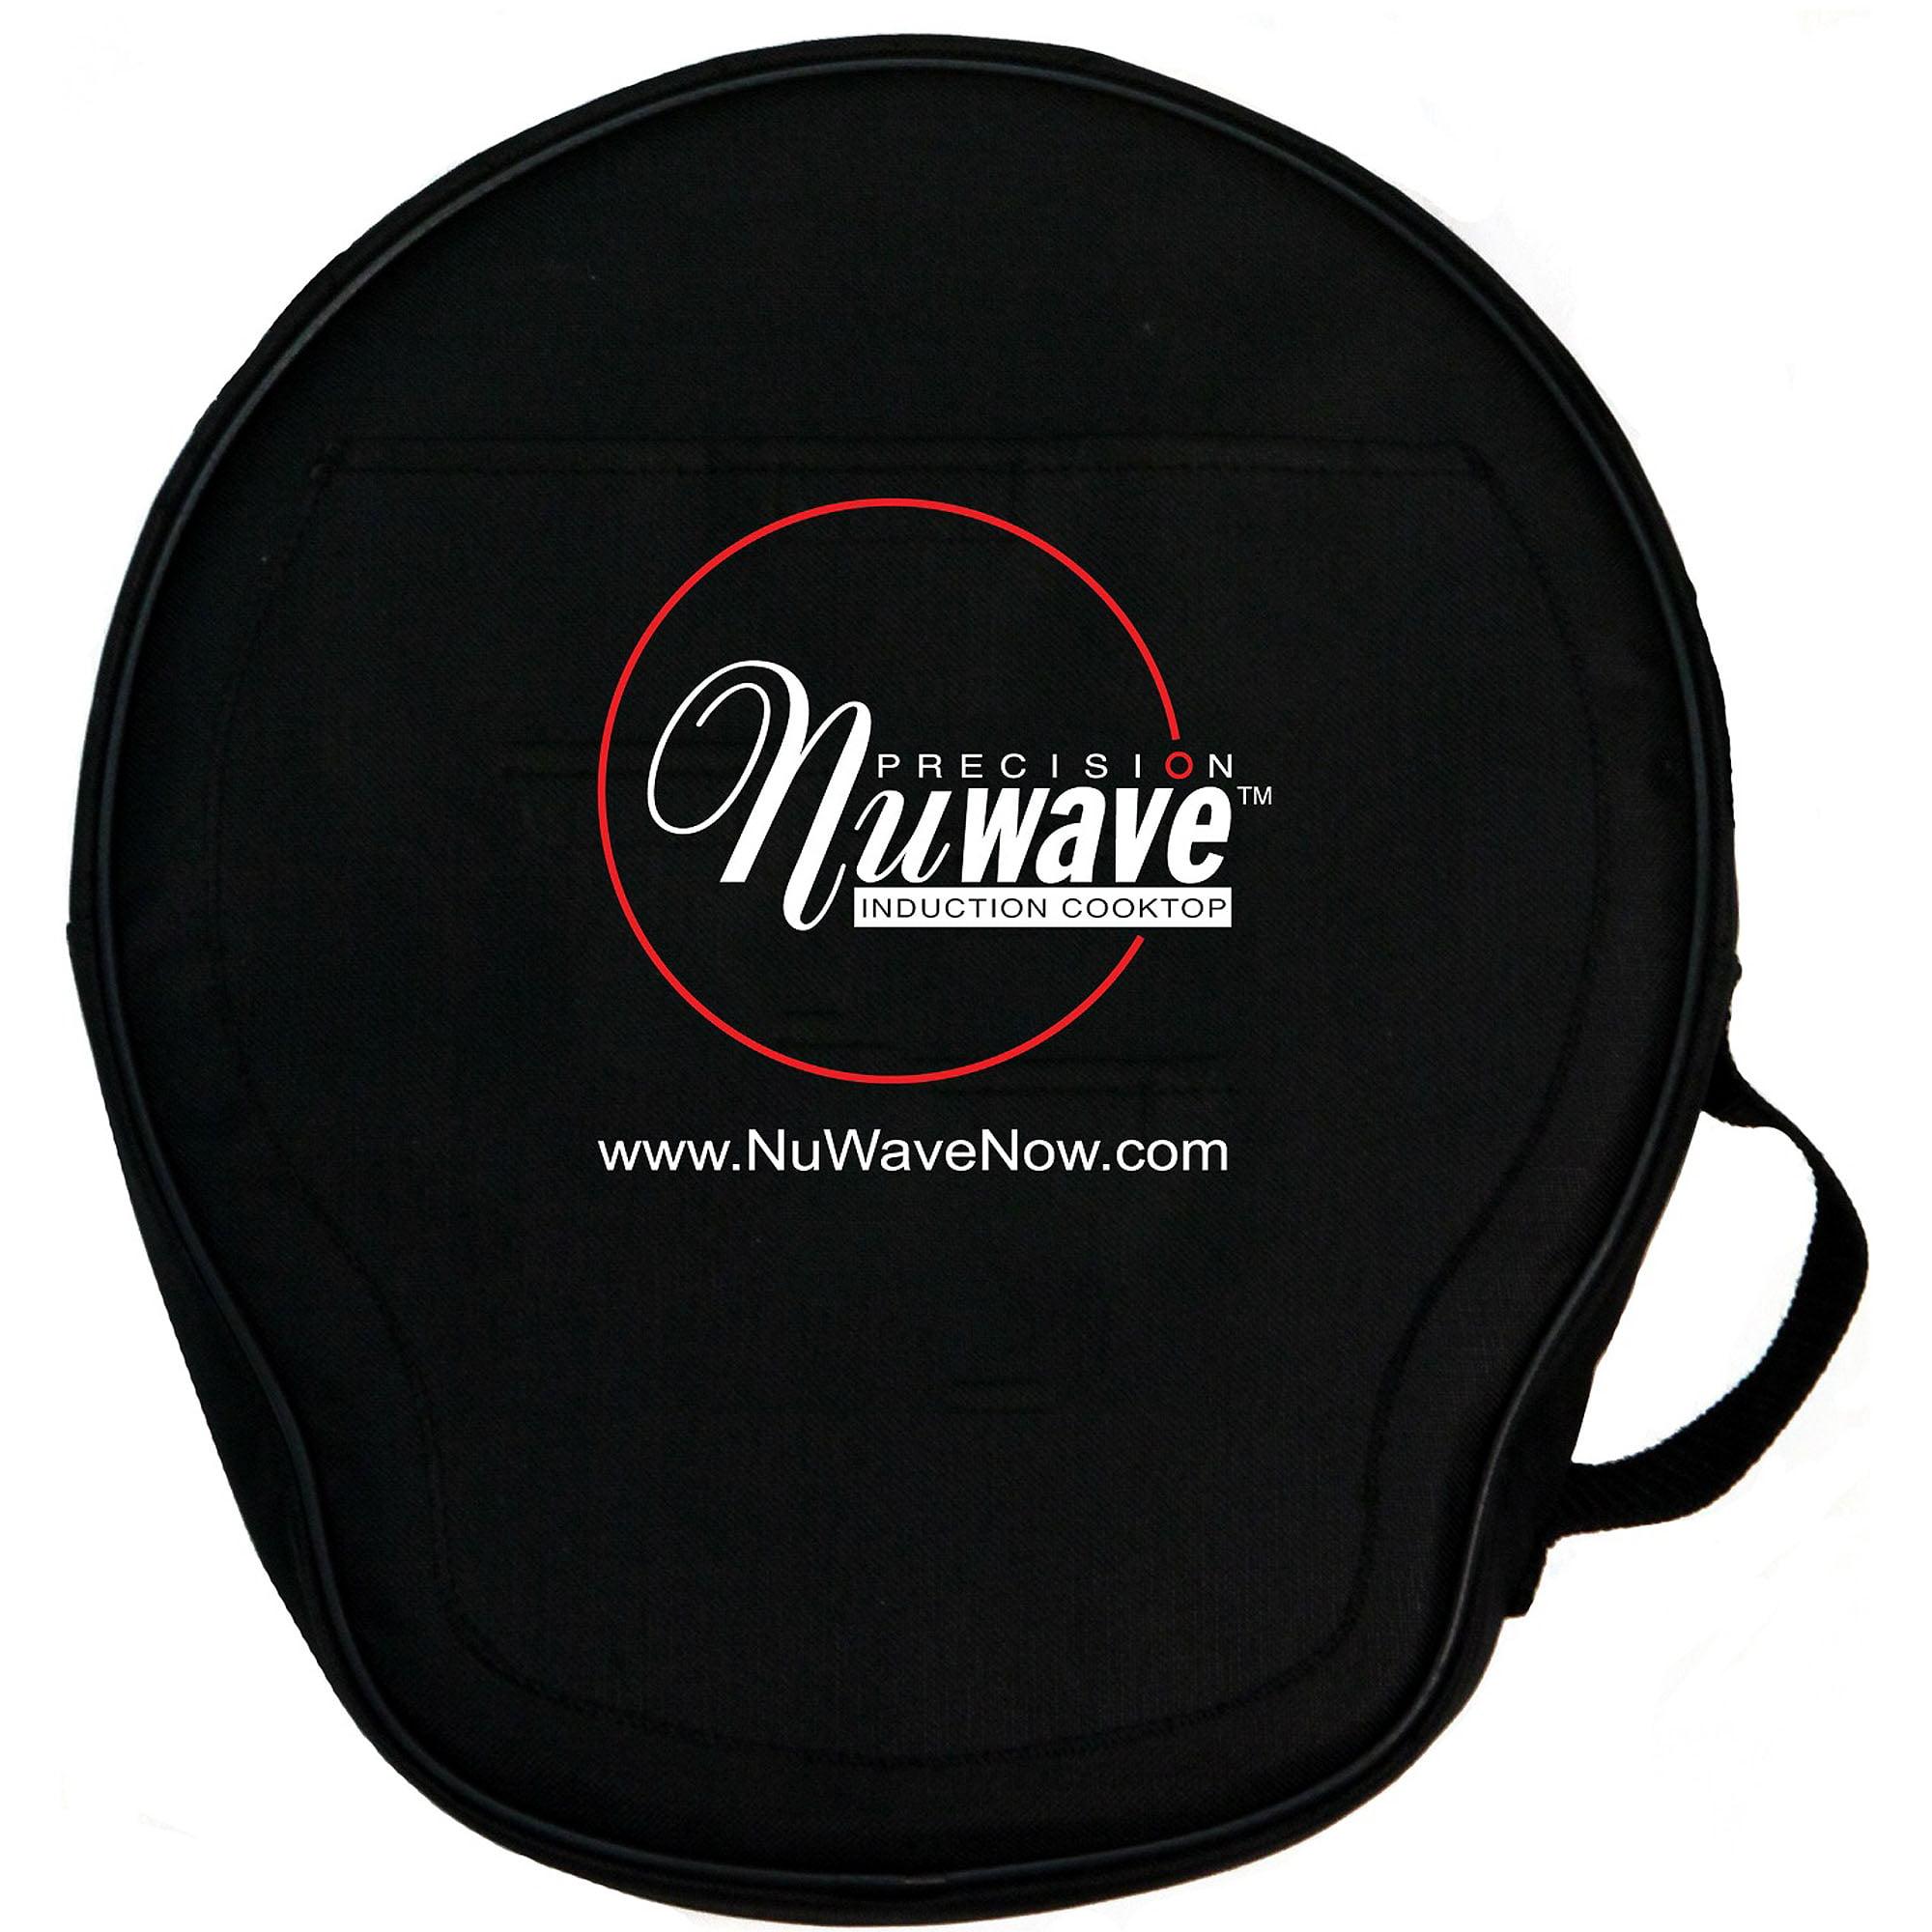 Nuwave Cook Top Carrying Case Black Walmart